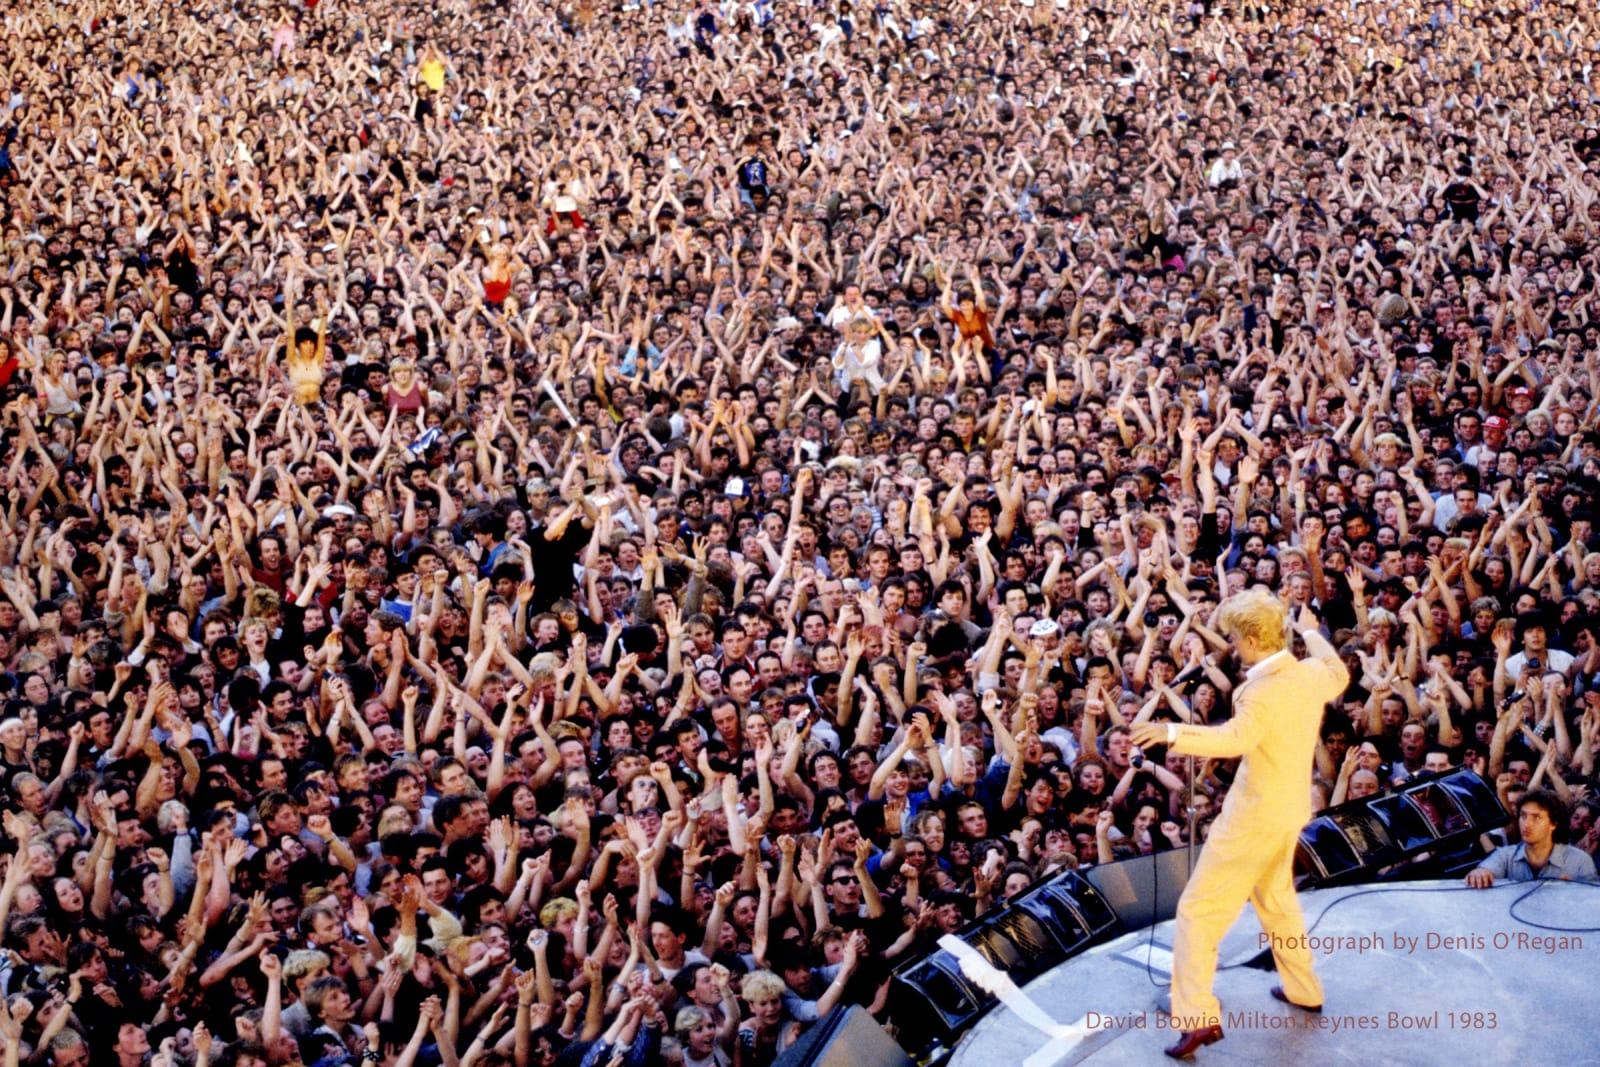 DAVID BOWIE, David Bowie Milton Keynes Bowl, 1983